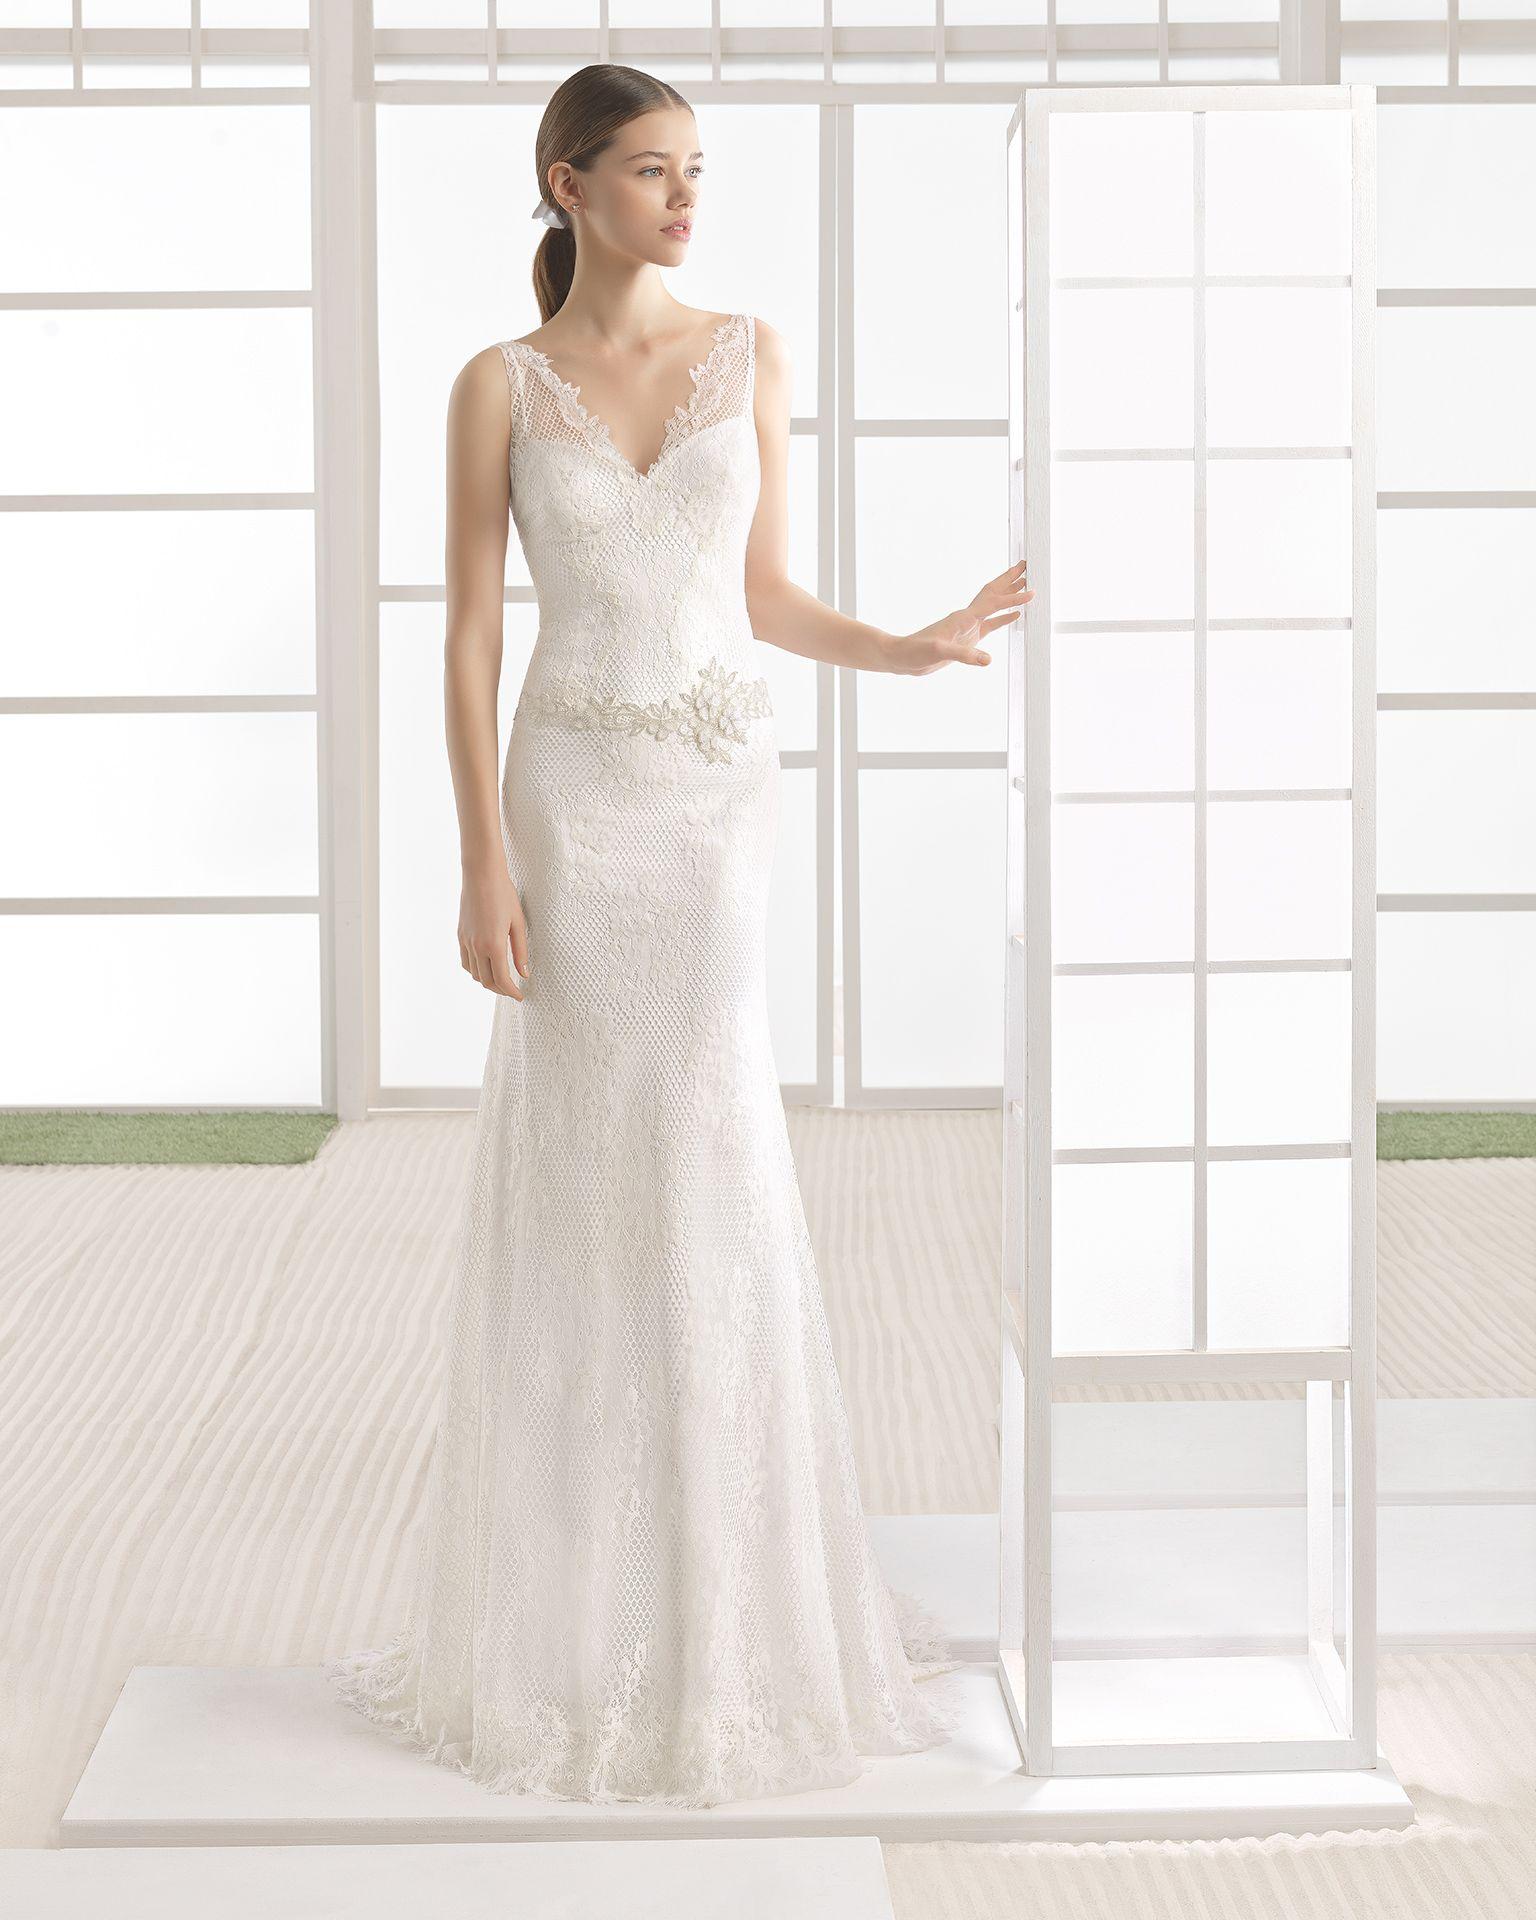 WAYA Hochzeit 2017 Kollektion Rosa Clará Soft